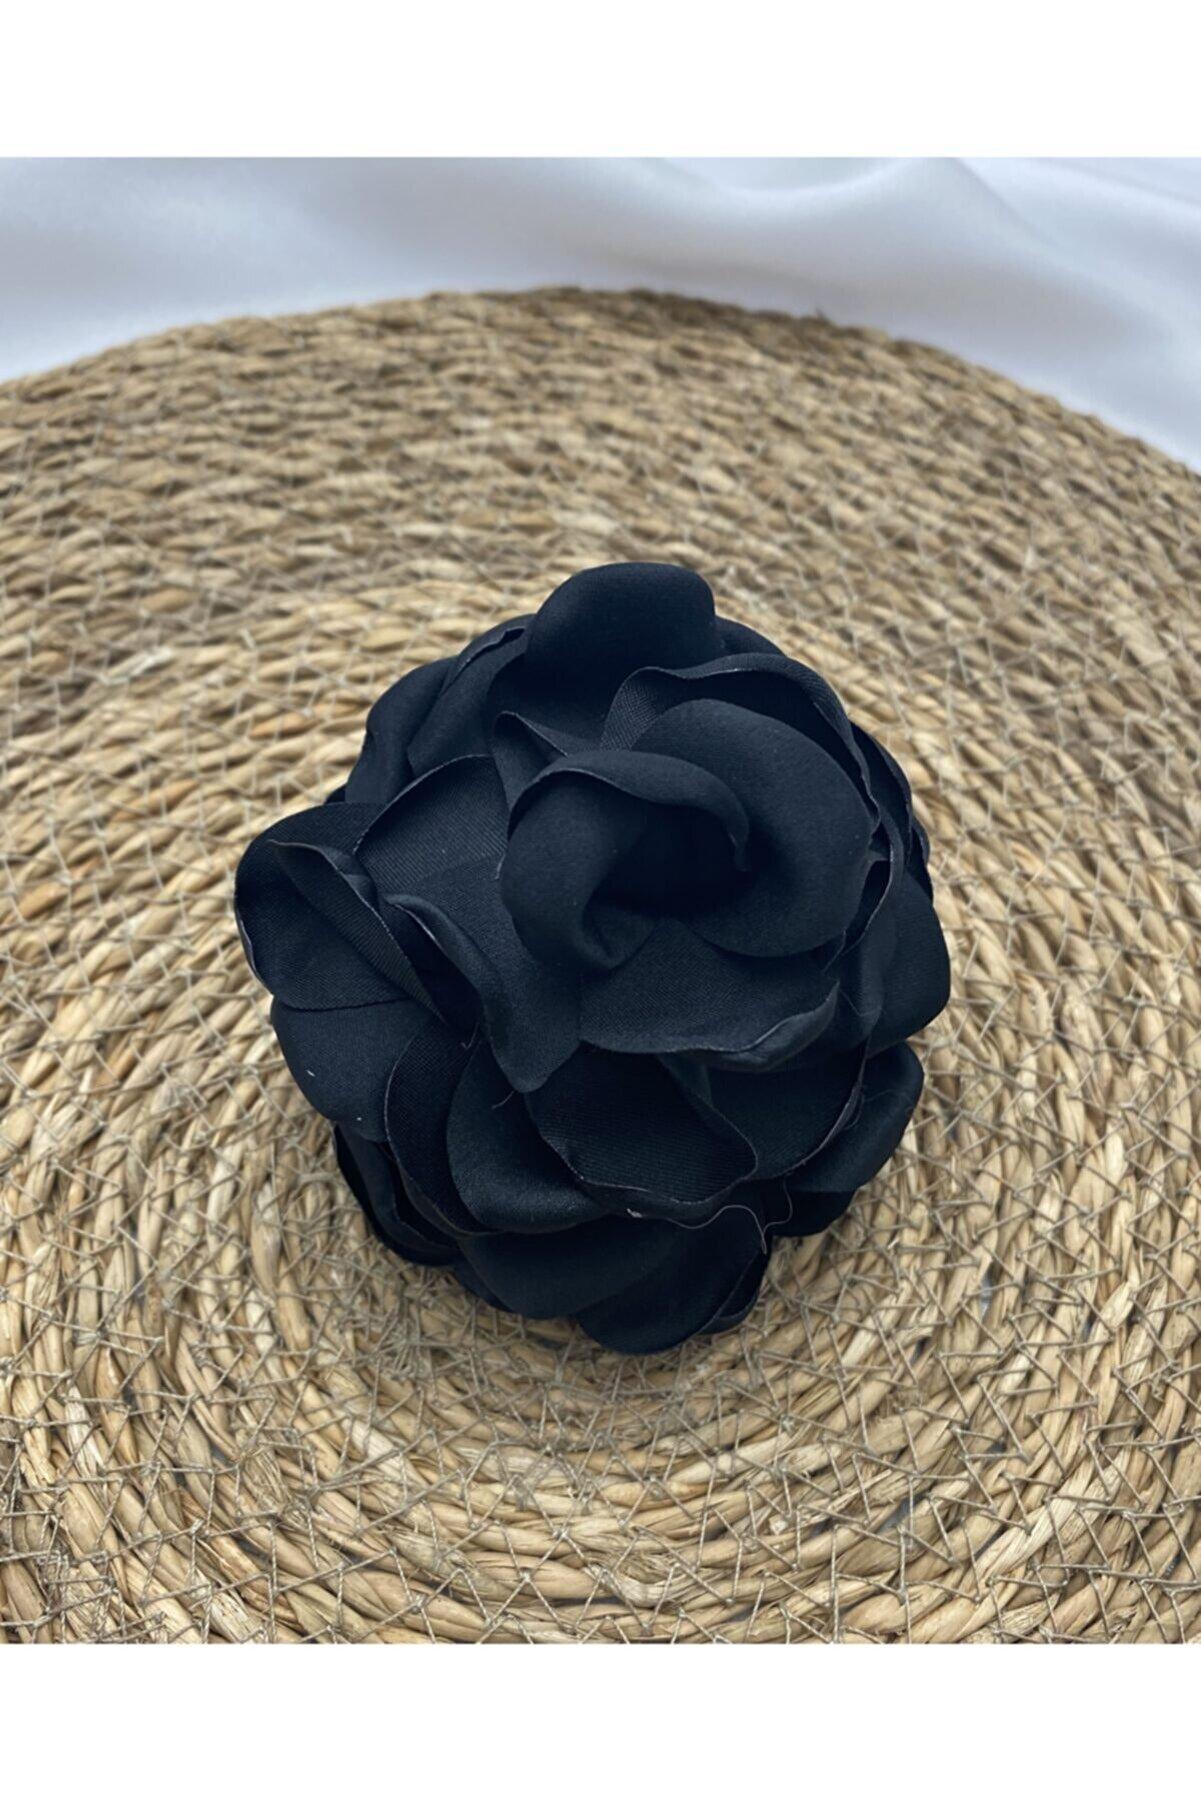 elittrendshop Güllü Topuz Mandal Toka Siyah Renk Yeni Model(7cm )